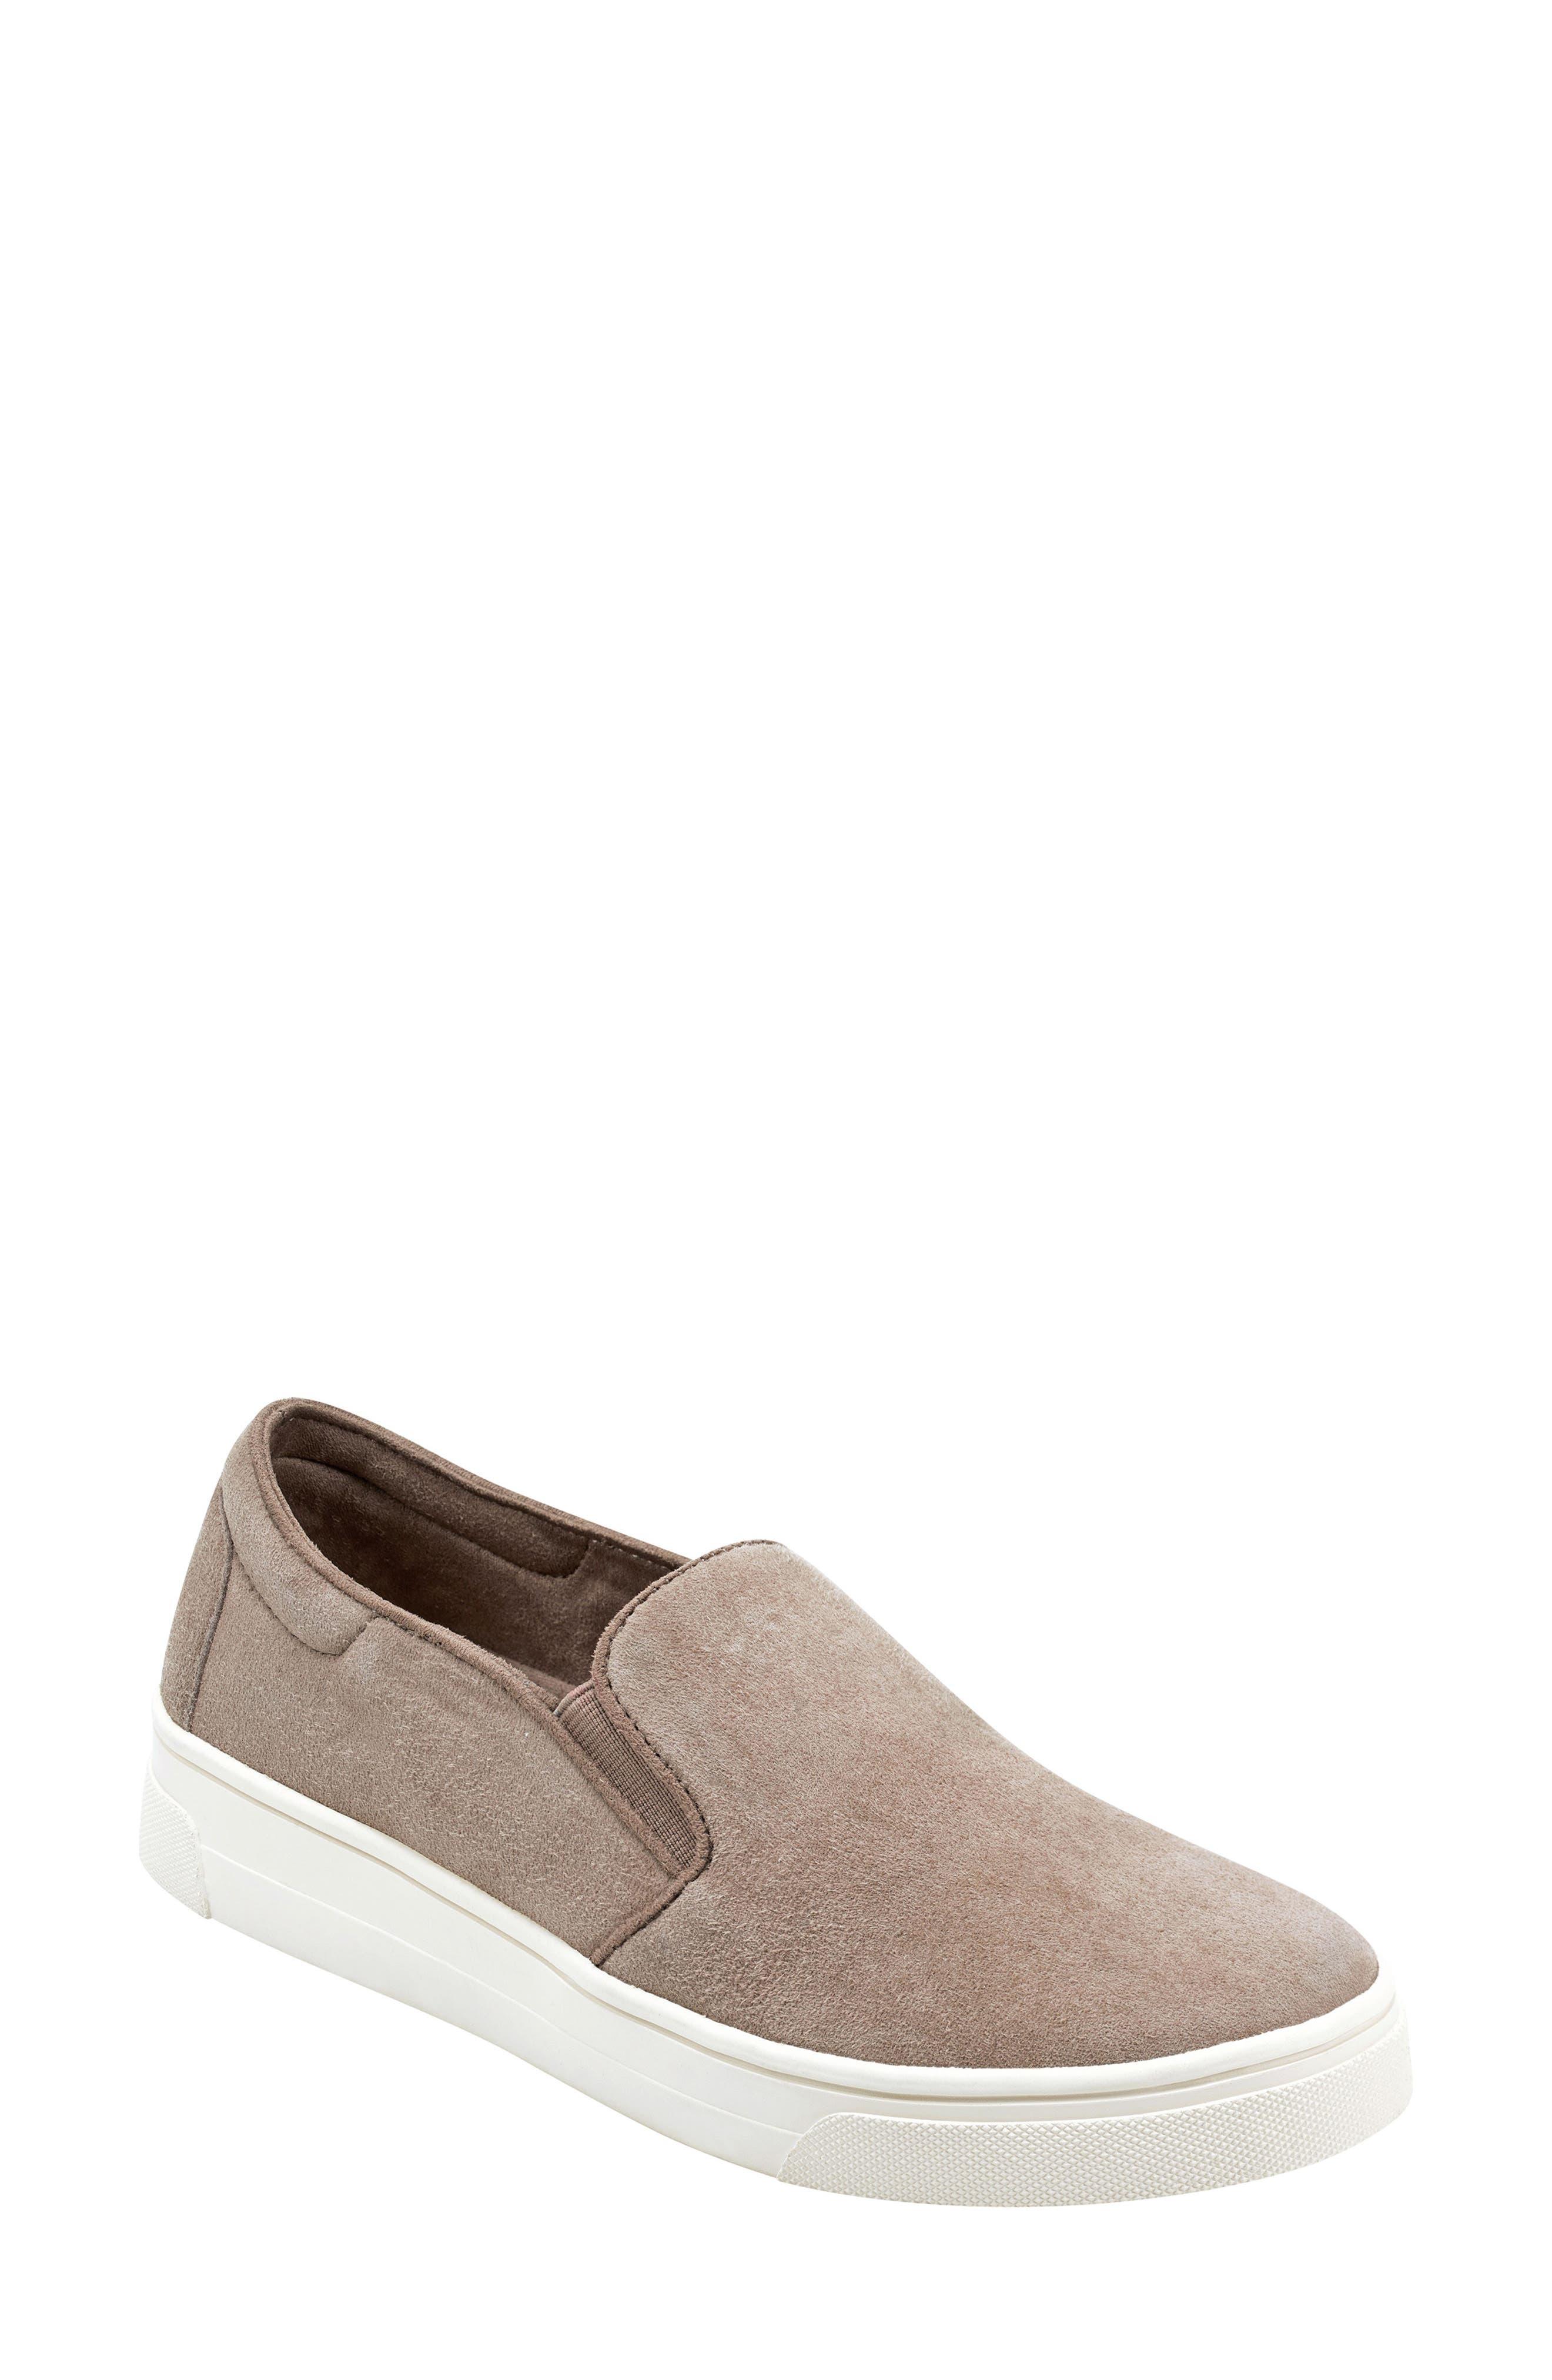 Image of EVOLVE Lack Slip-On Sneaker